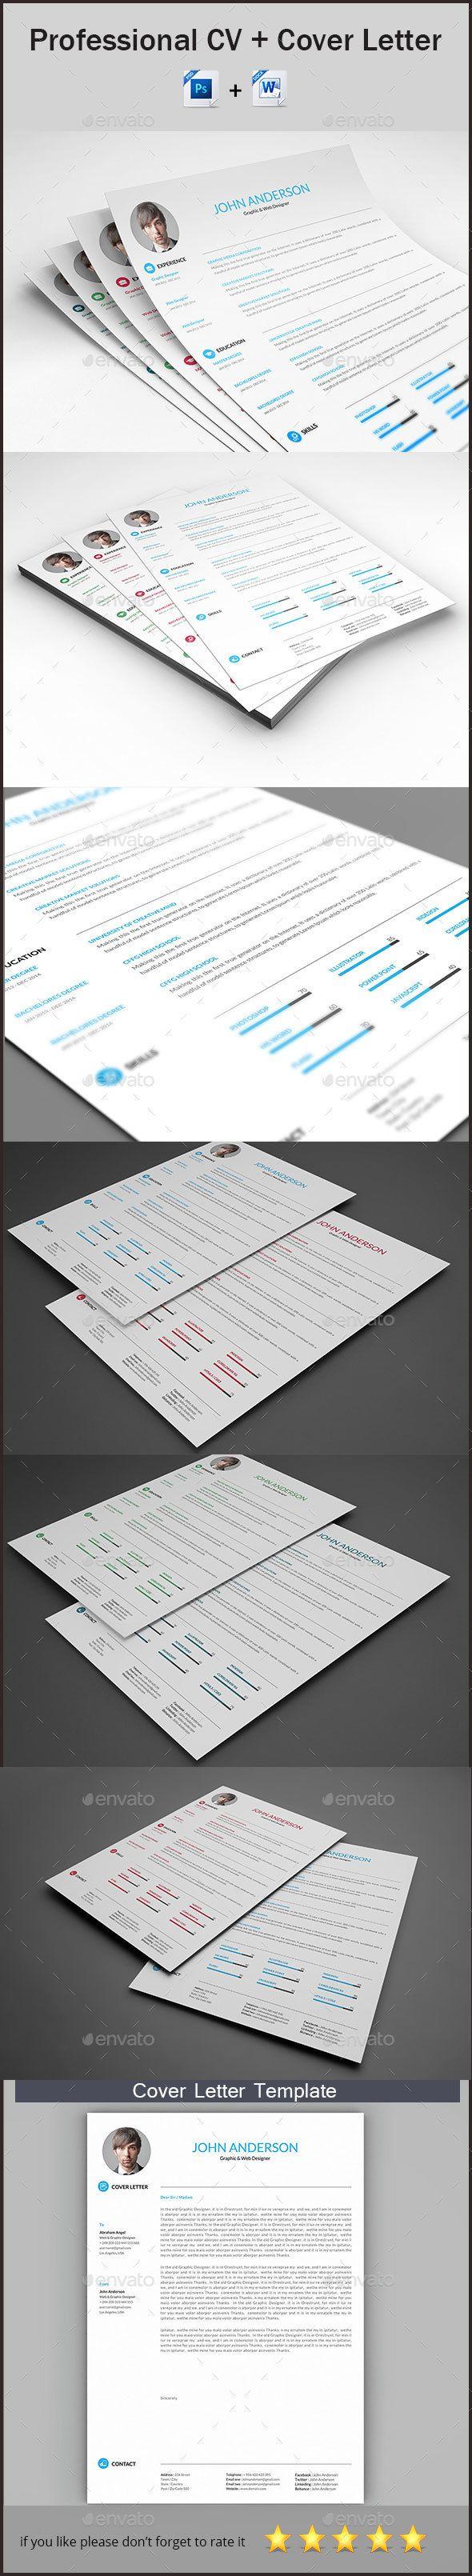 CV Template PSD, MS Word